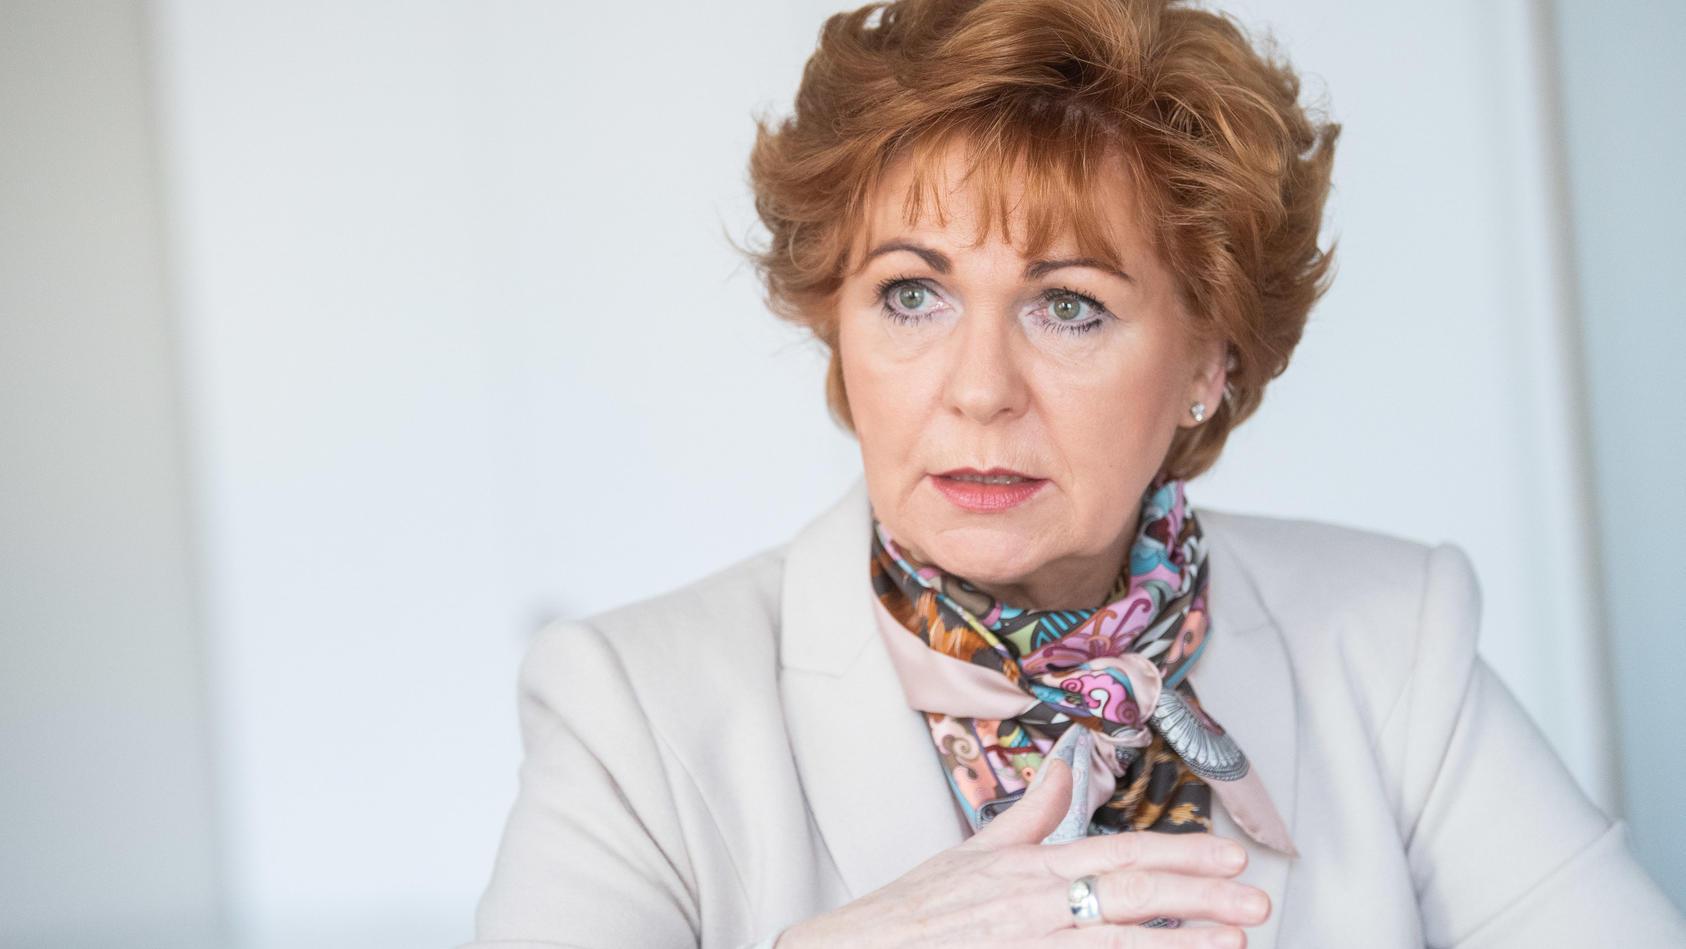 Justizministerin Barbara Havliza warnt vor Radikalisierung.